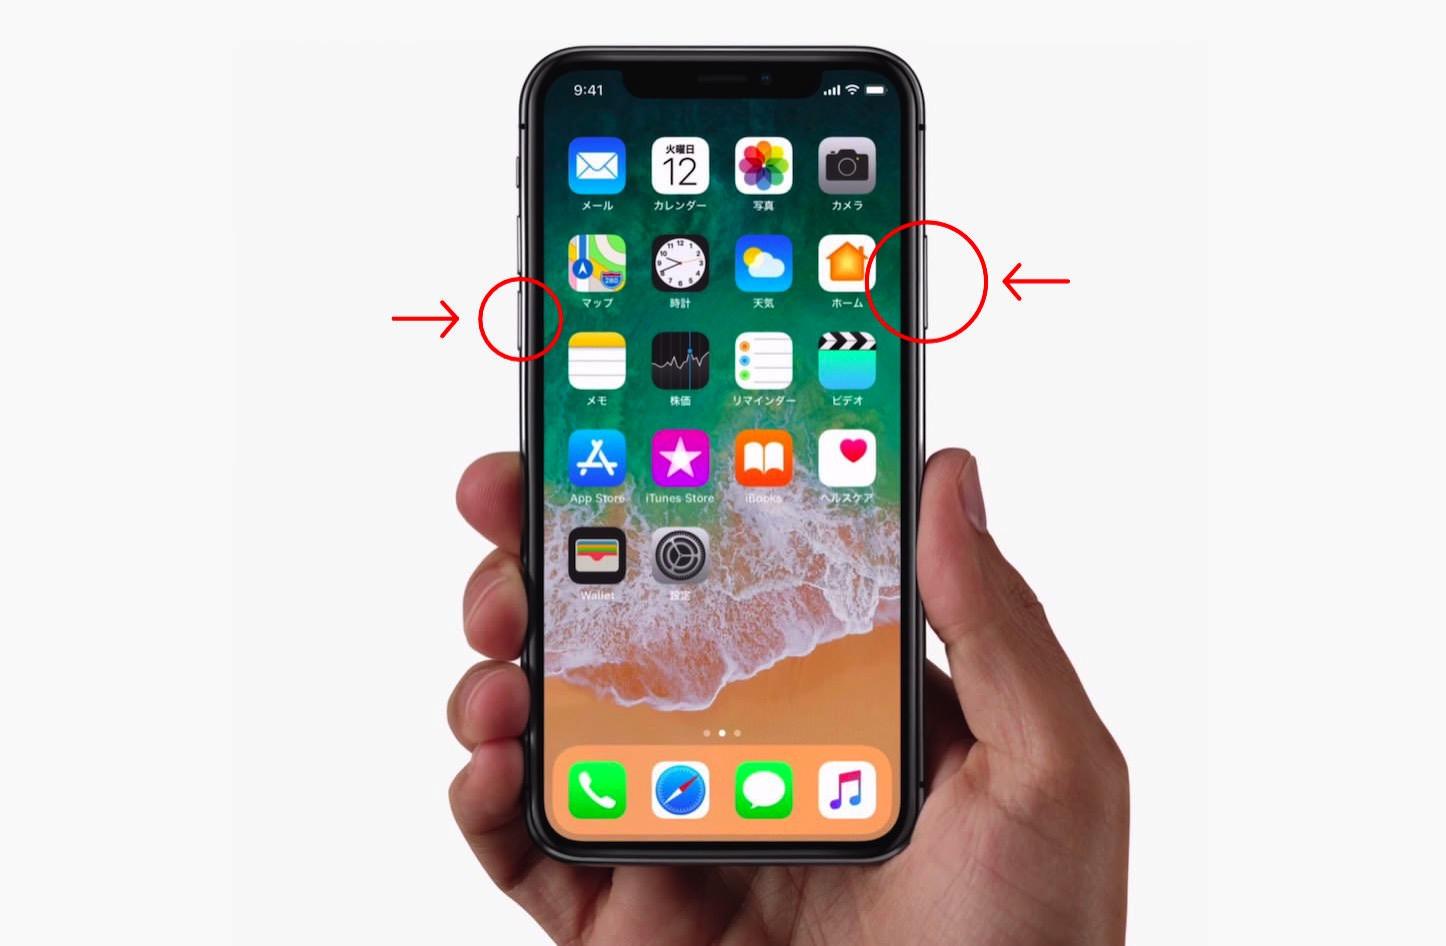 Iphonex reset